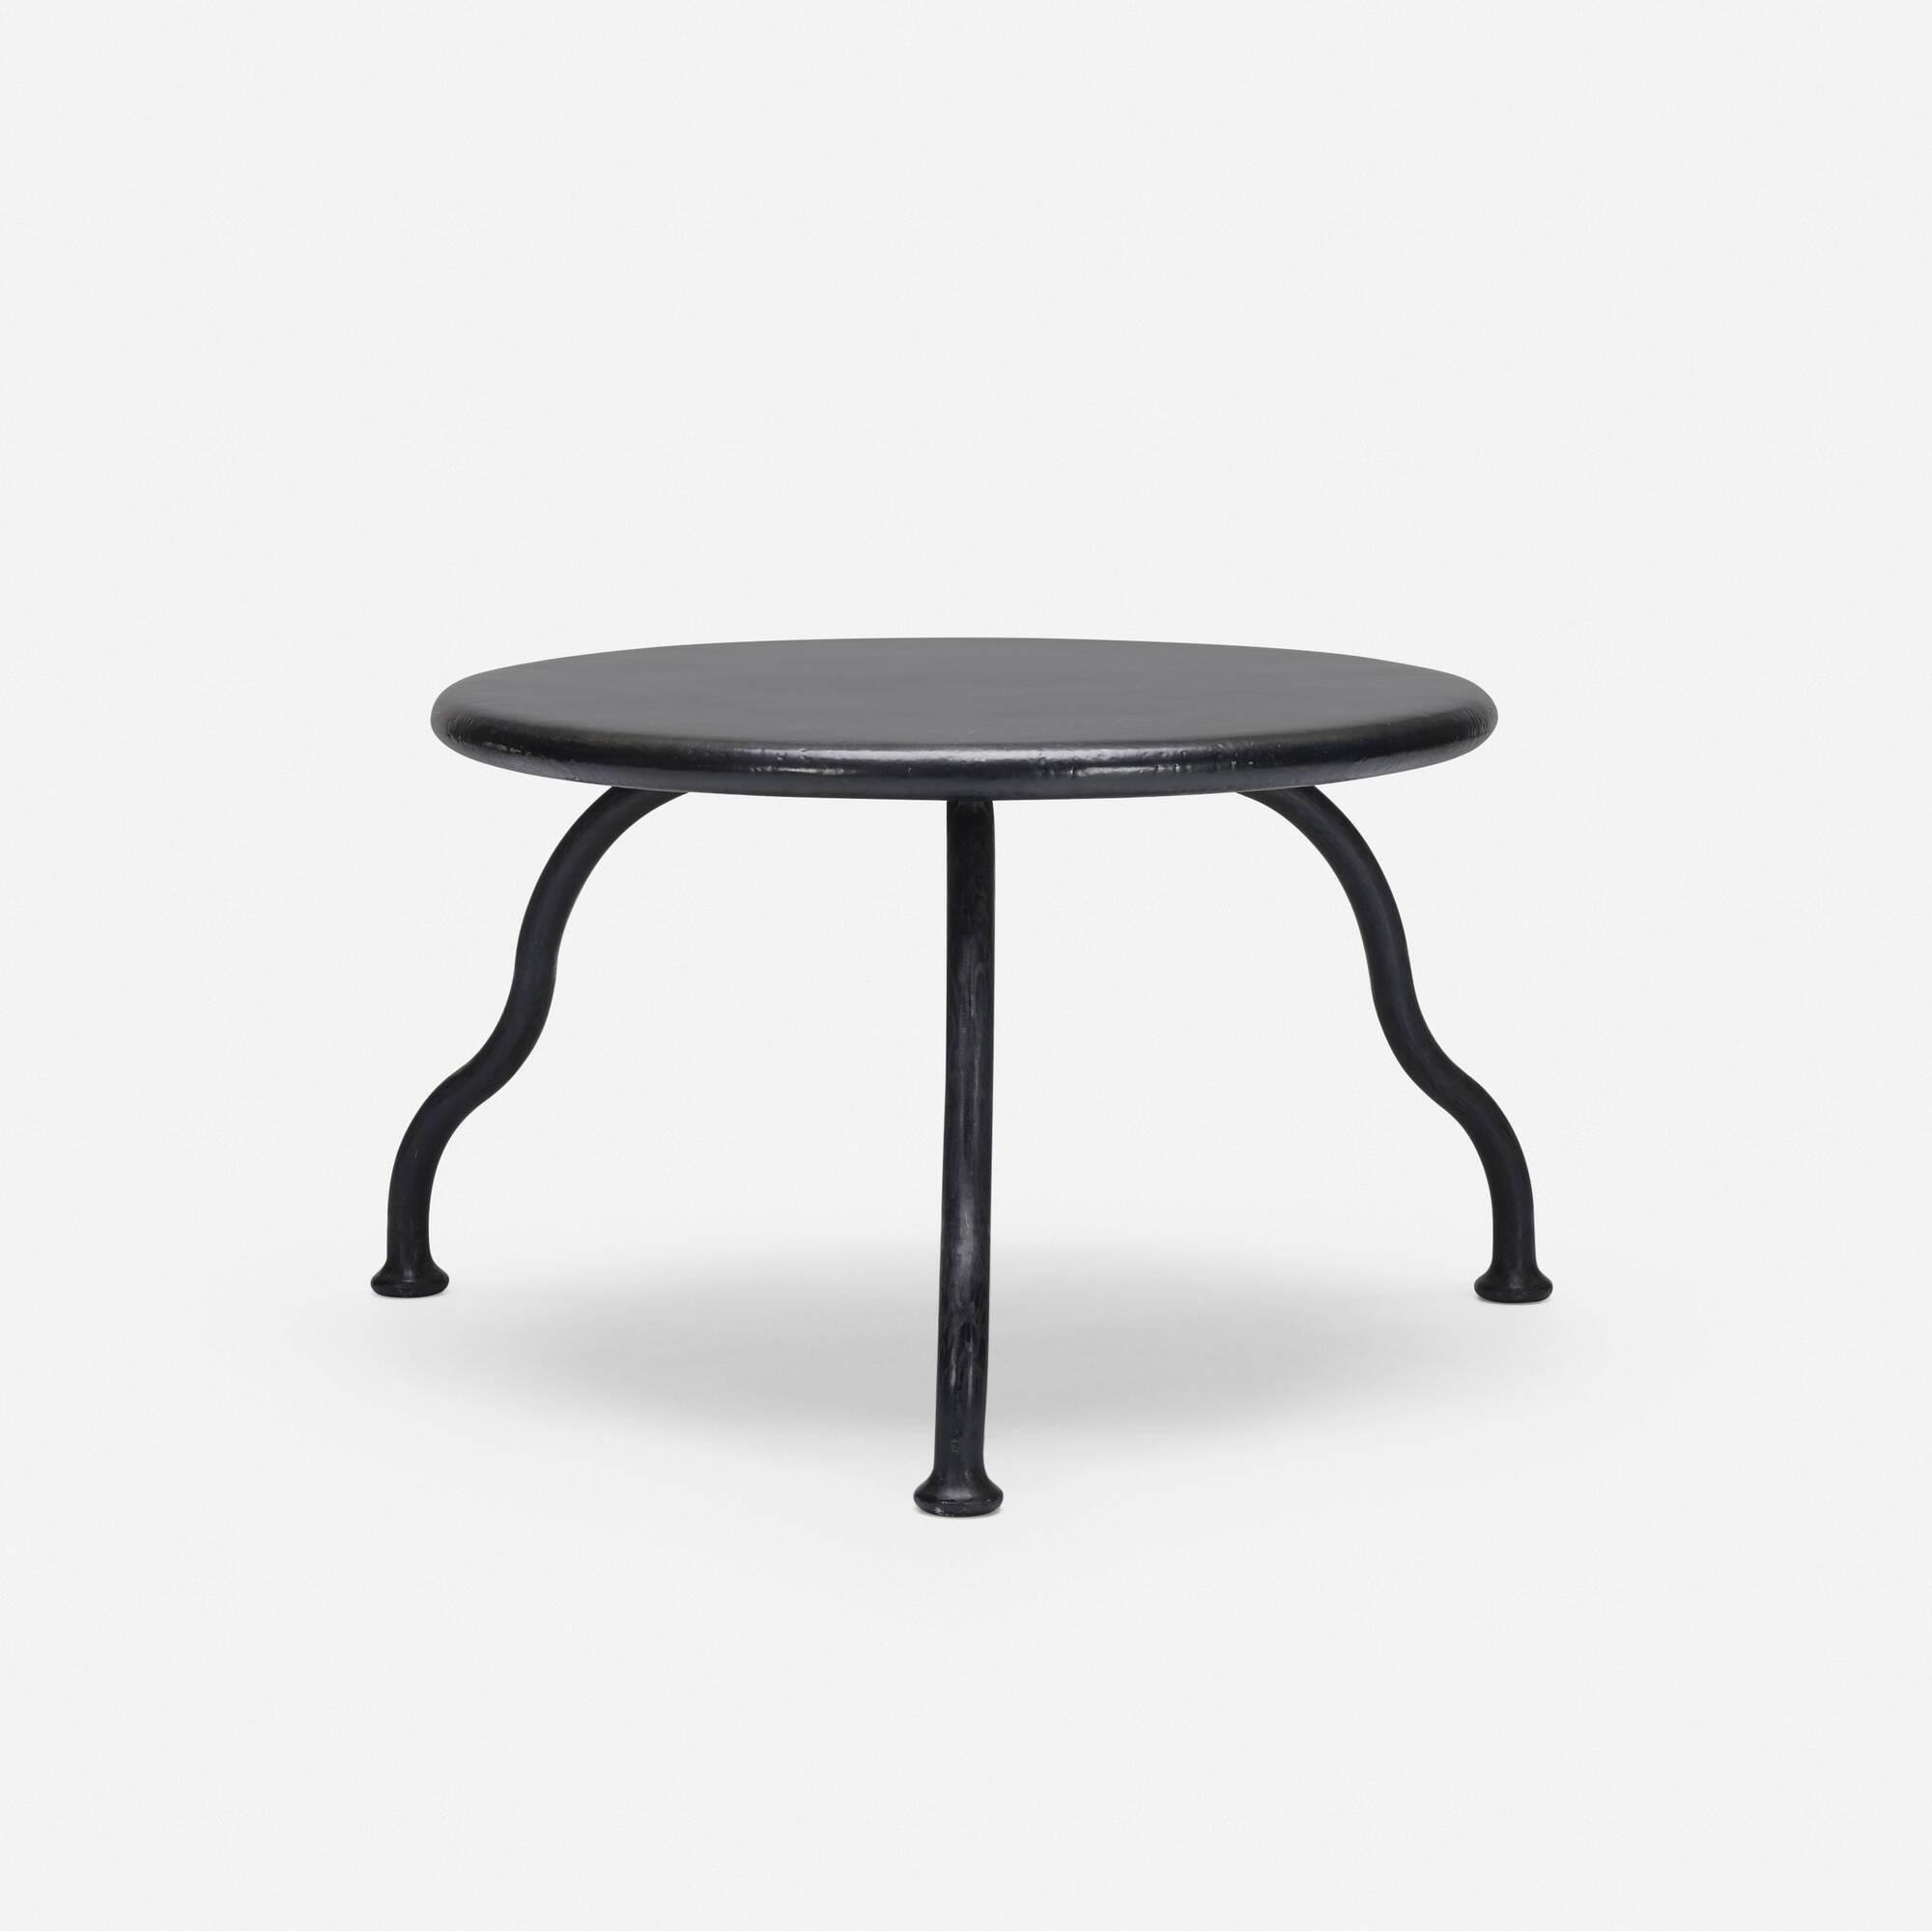 138: Atelier Van Lieshout / Bad Little Table (1 of 2)